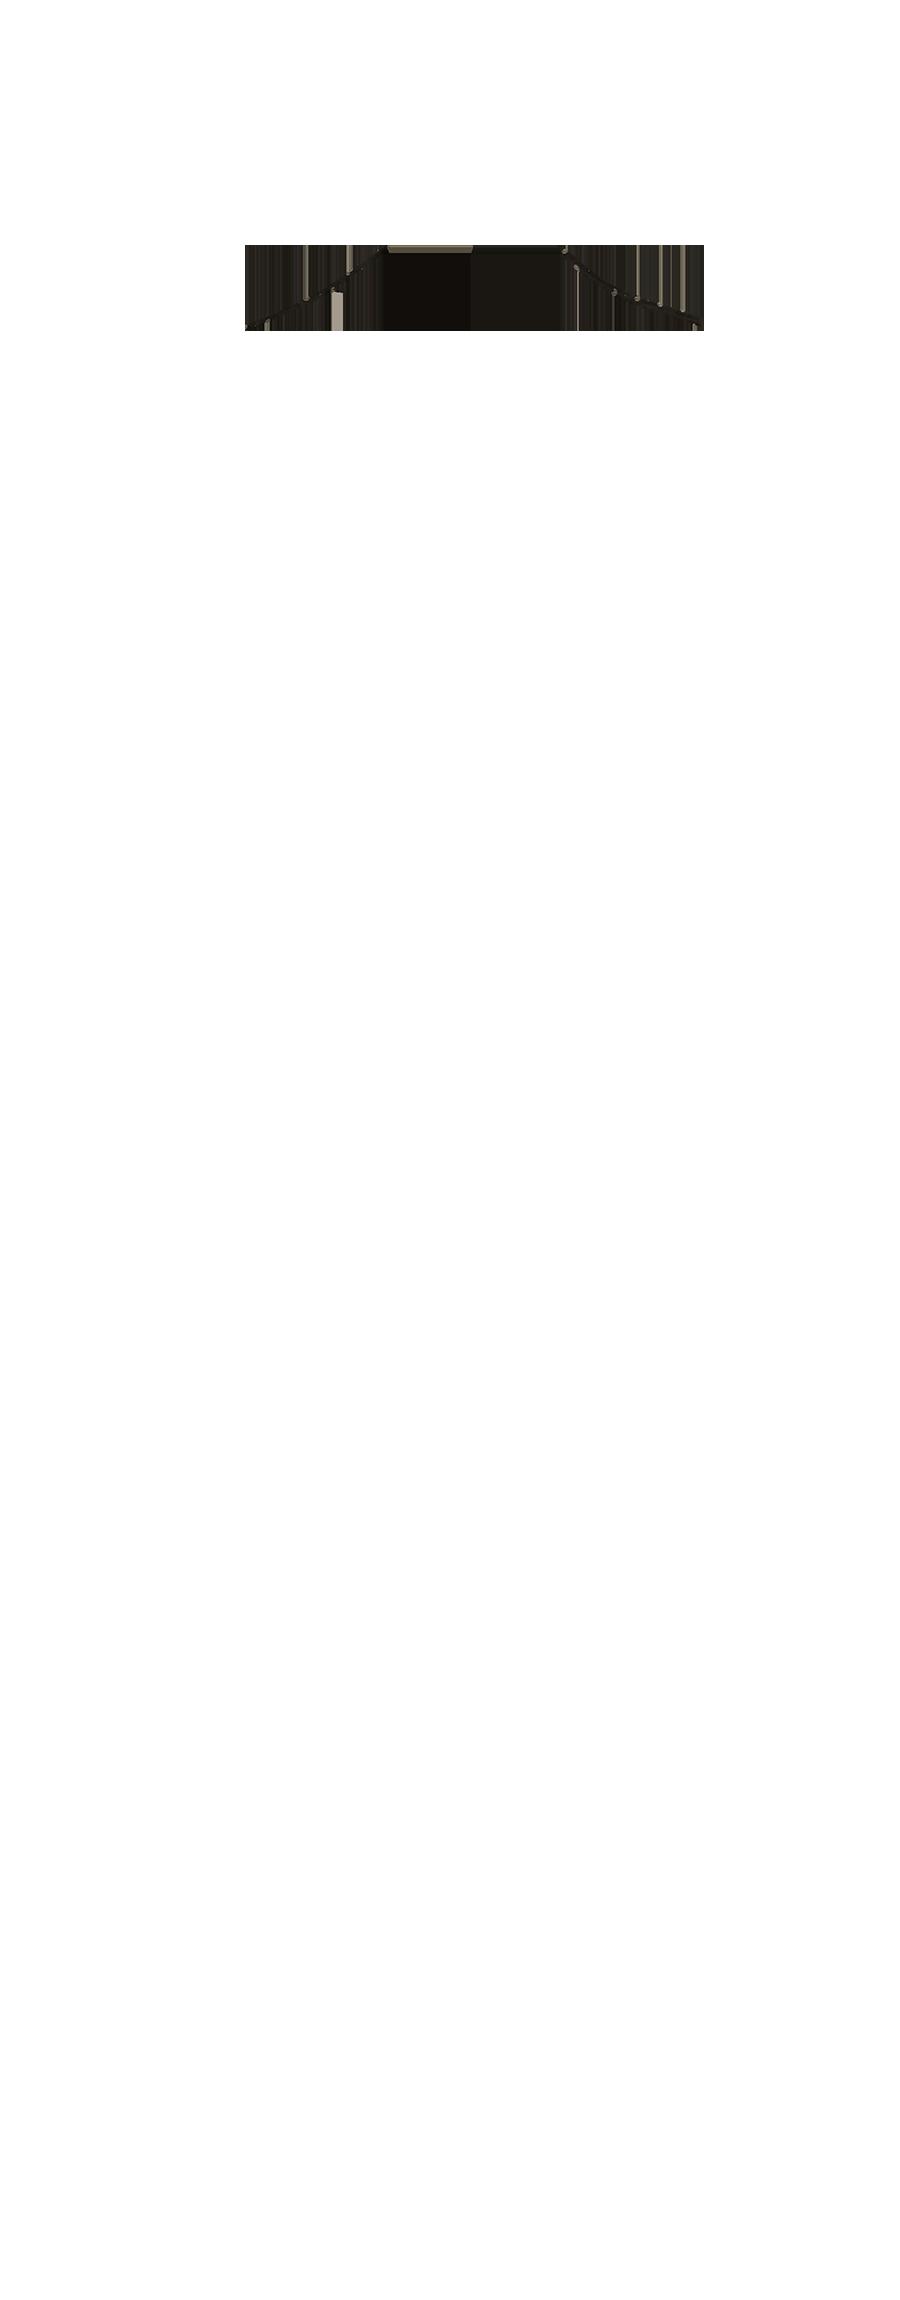 NEFL-16